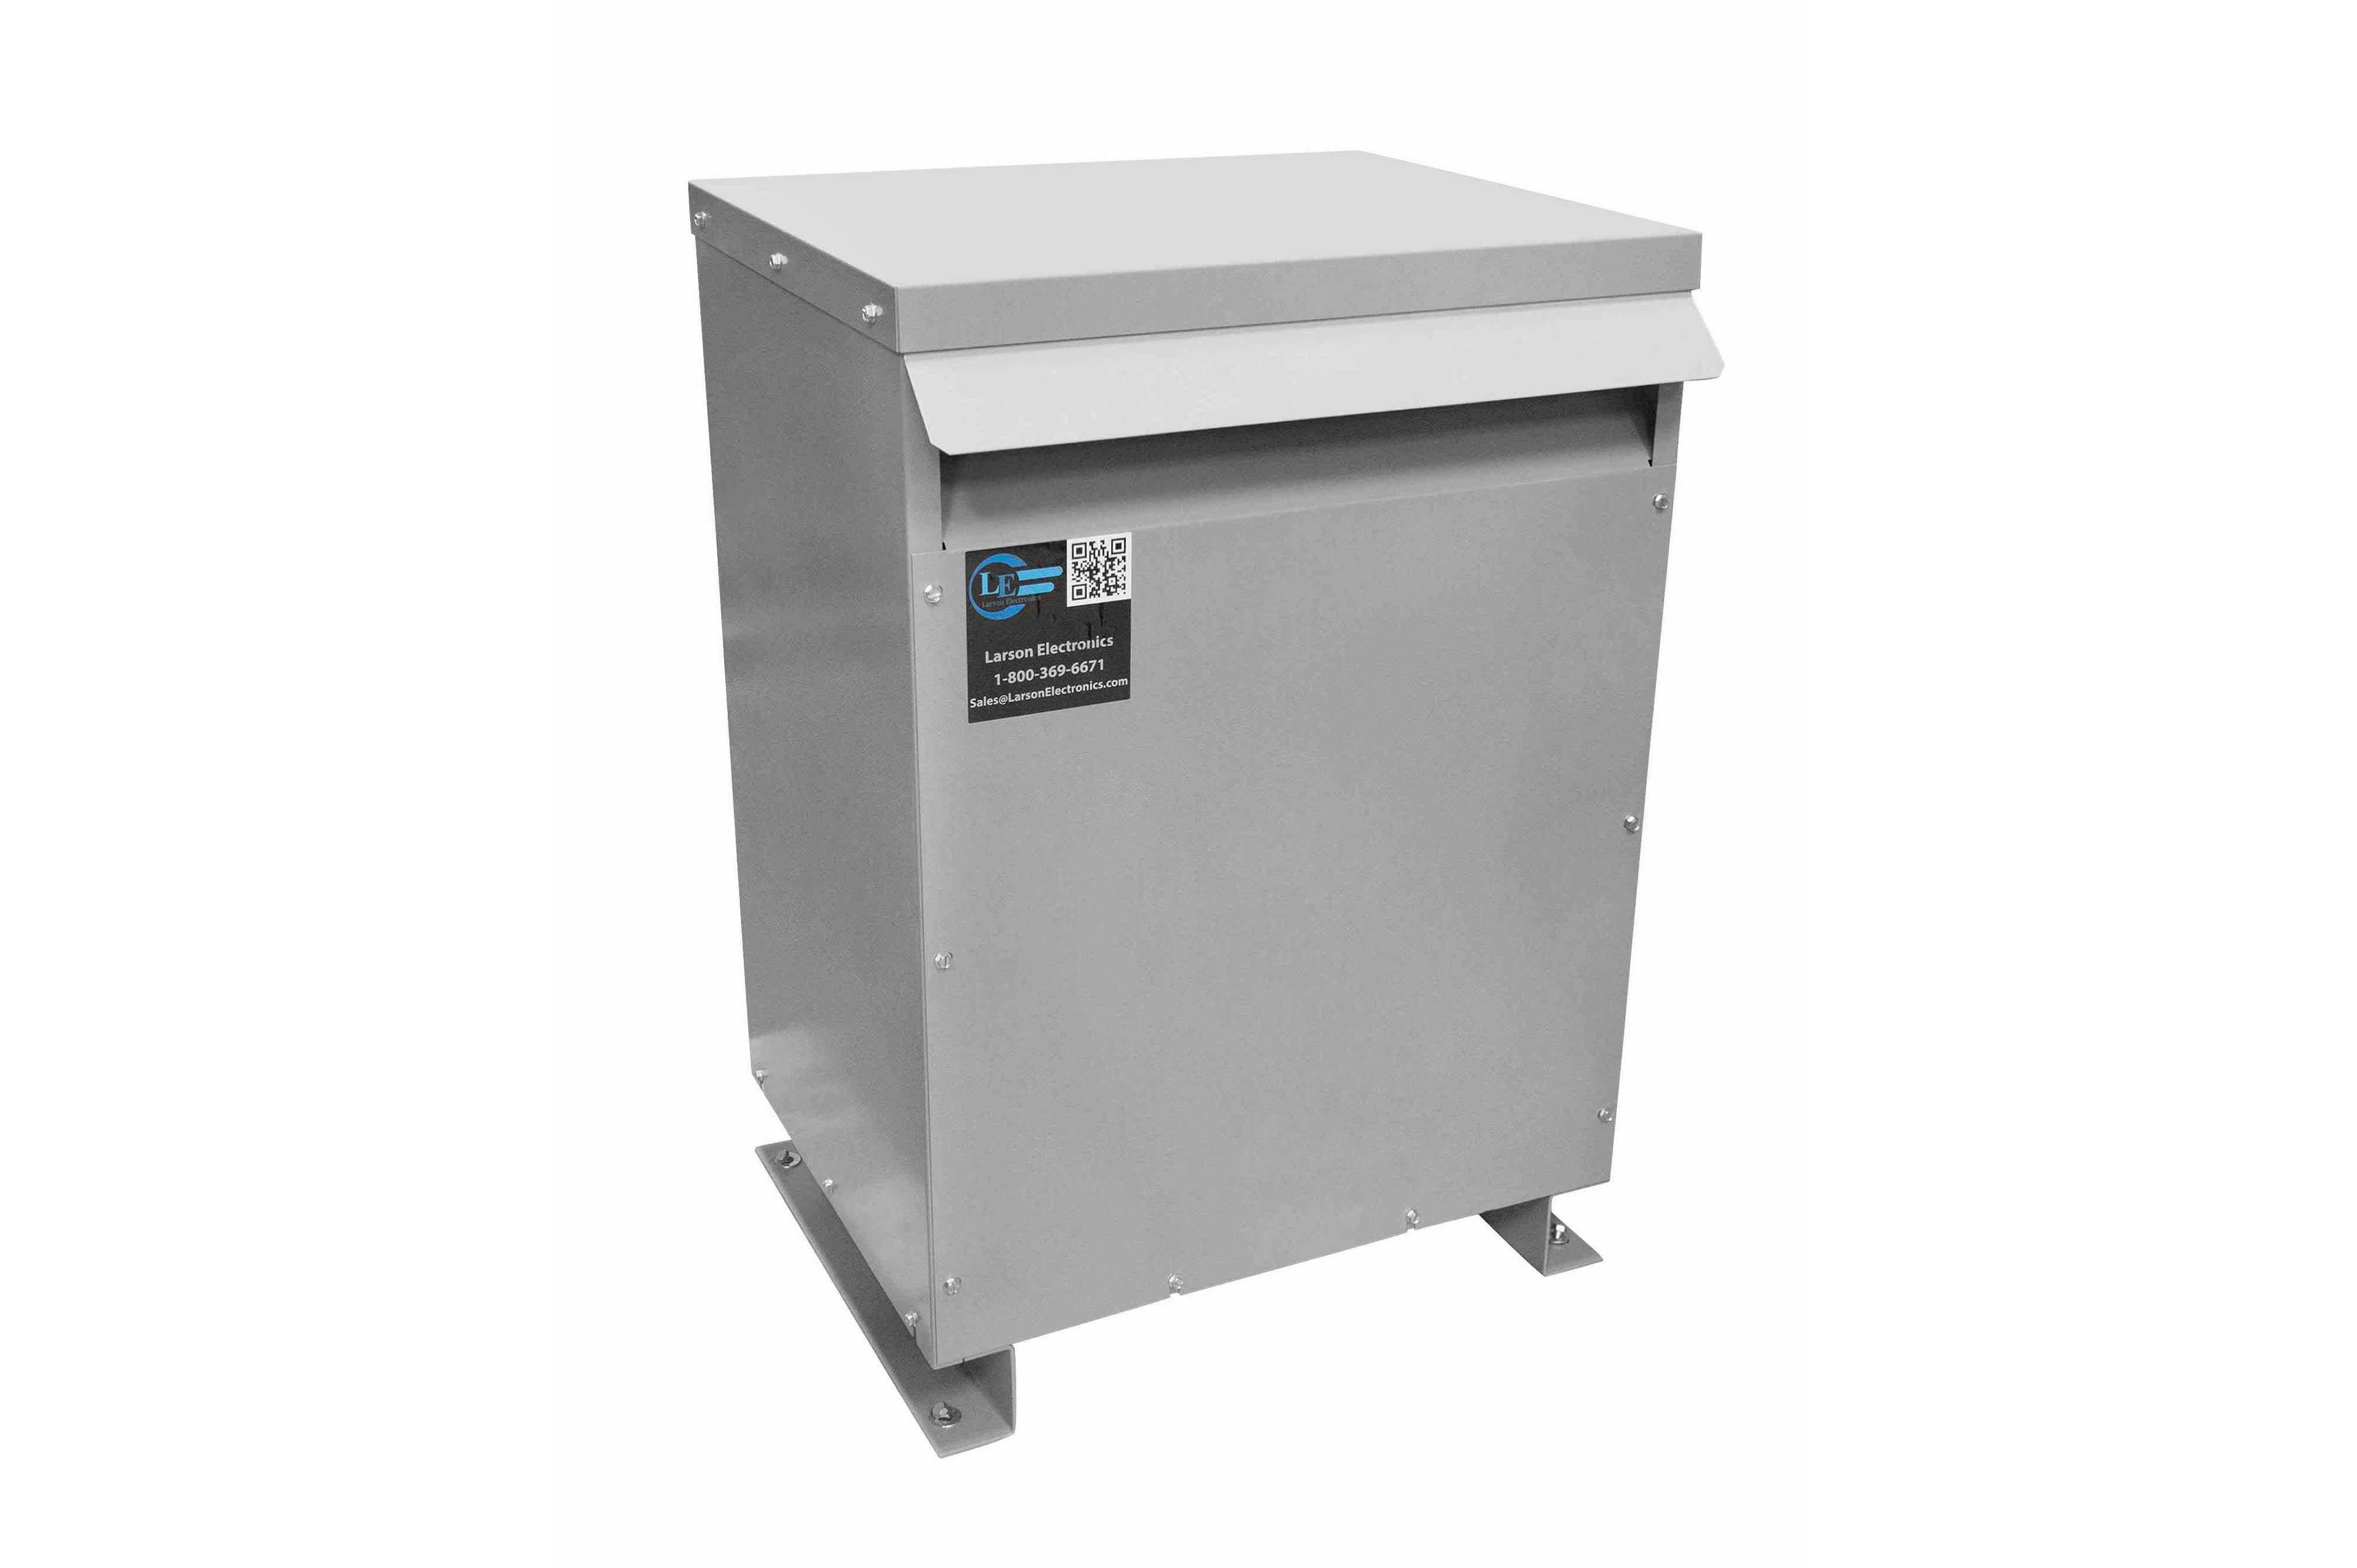 100 kVA 3PH DOE Transformer, 480V Delta Primary, 575Y/332 Wye-N Secondary, N3R, Ventilated, 60 Hz